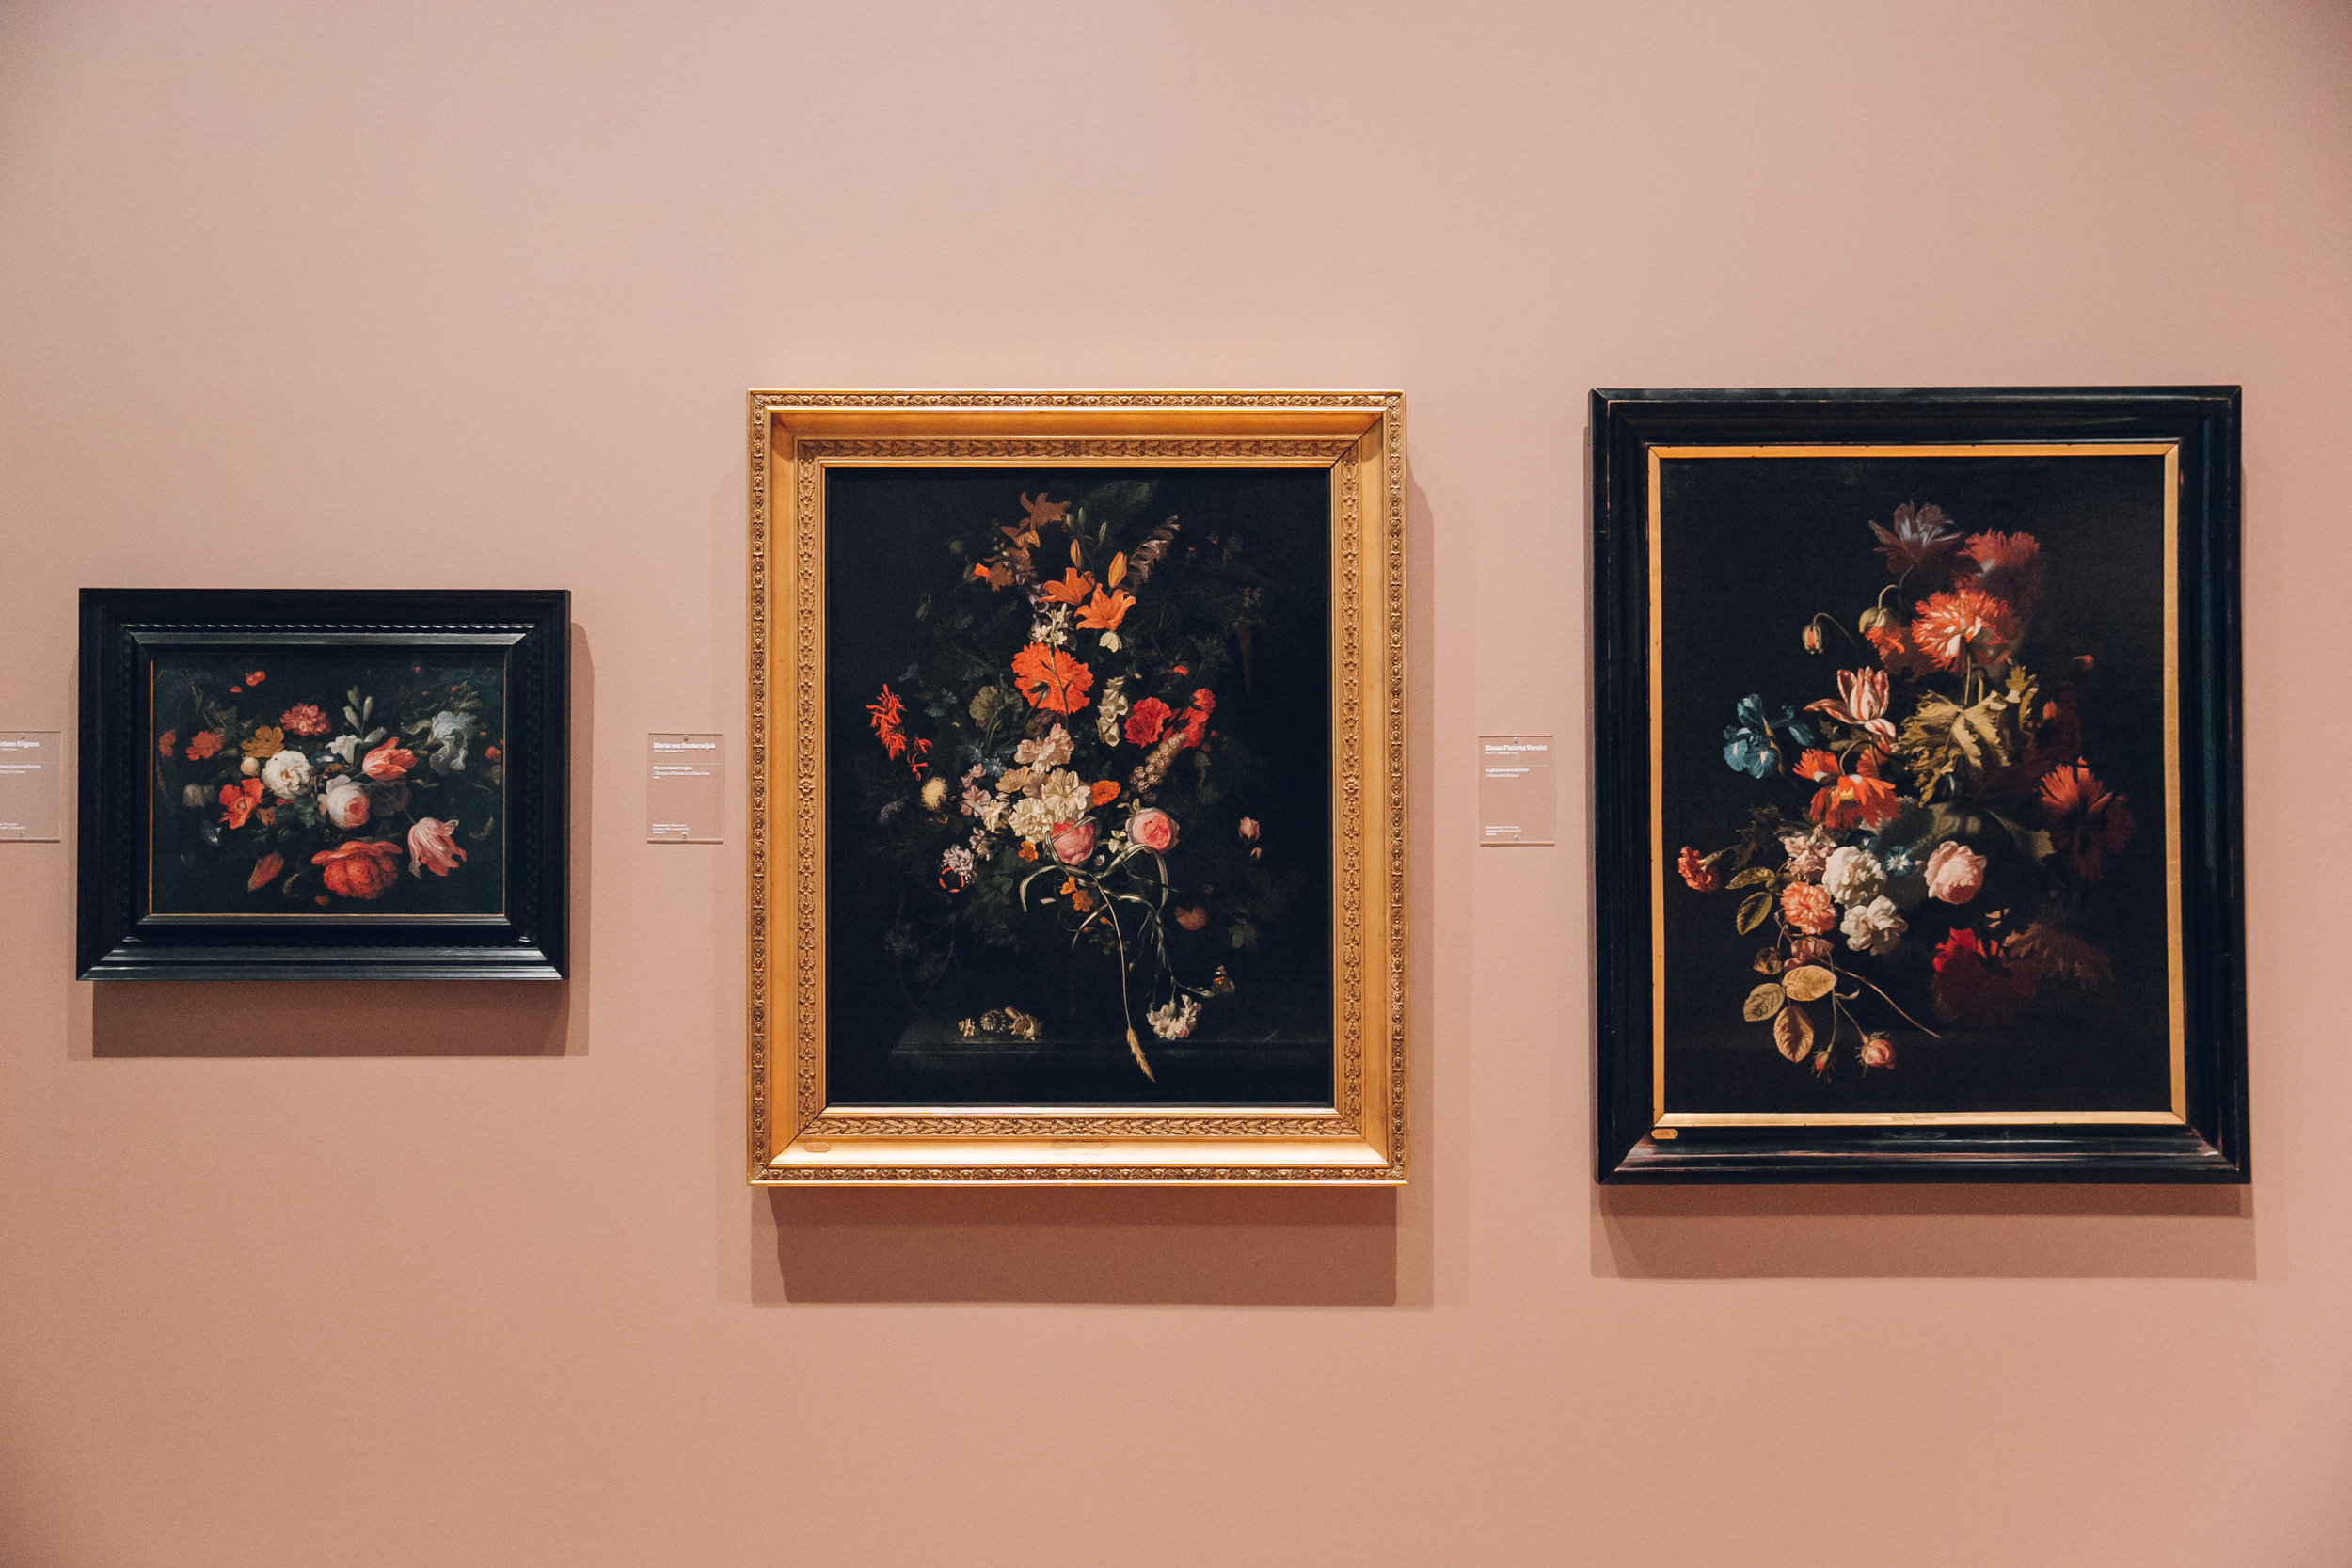 Still life floral paintings at SMK gallery in Copenhagen.